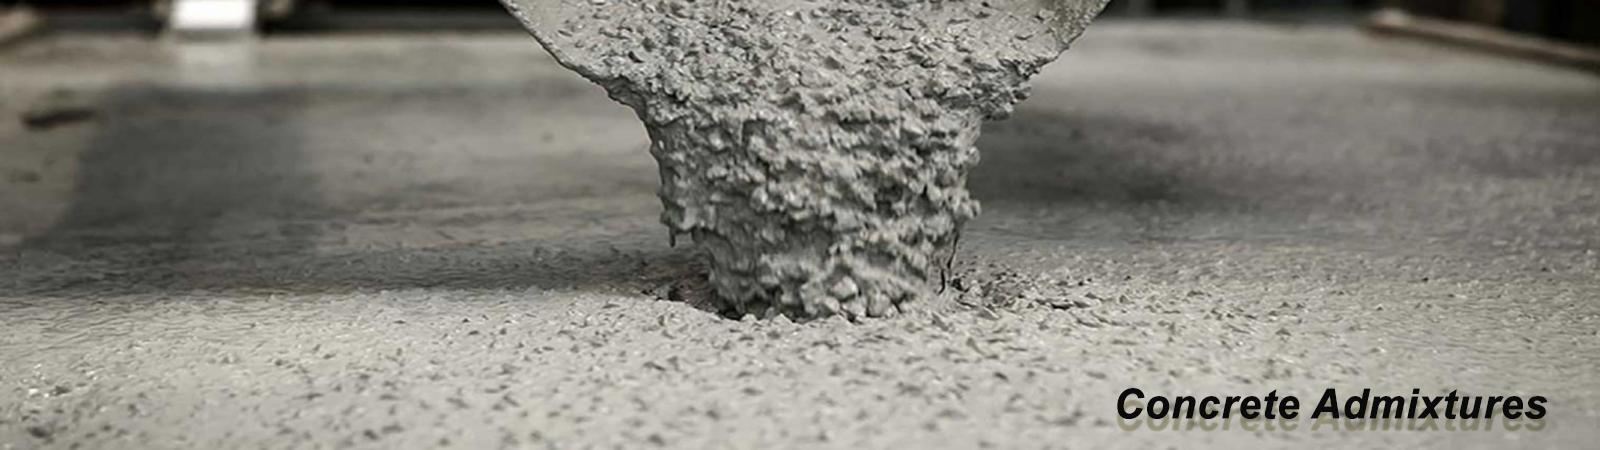 Concrete Admixtures, concrete admixtures market, plasticizers market in india, www.hibond.in